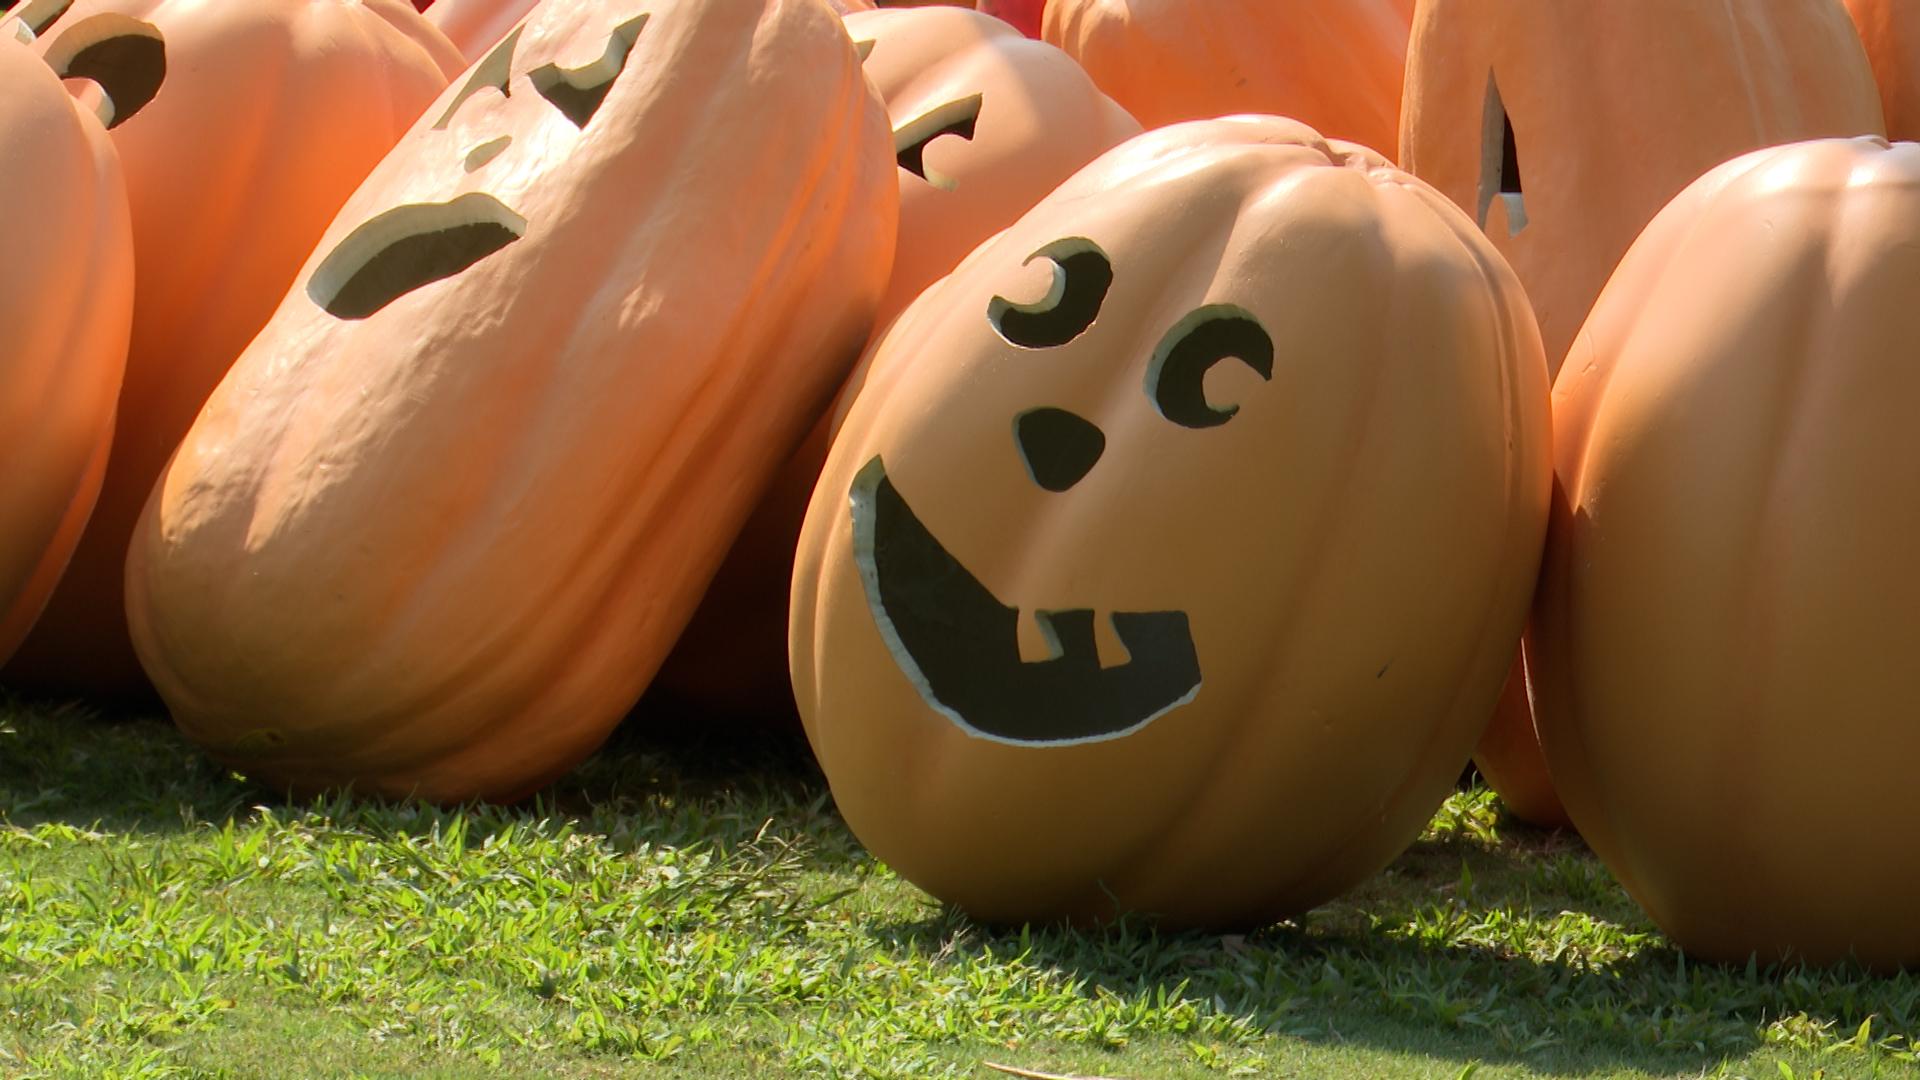 Callaway Gardens announcing Pumpkins at Callaway